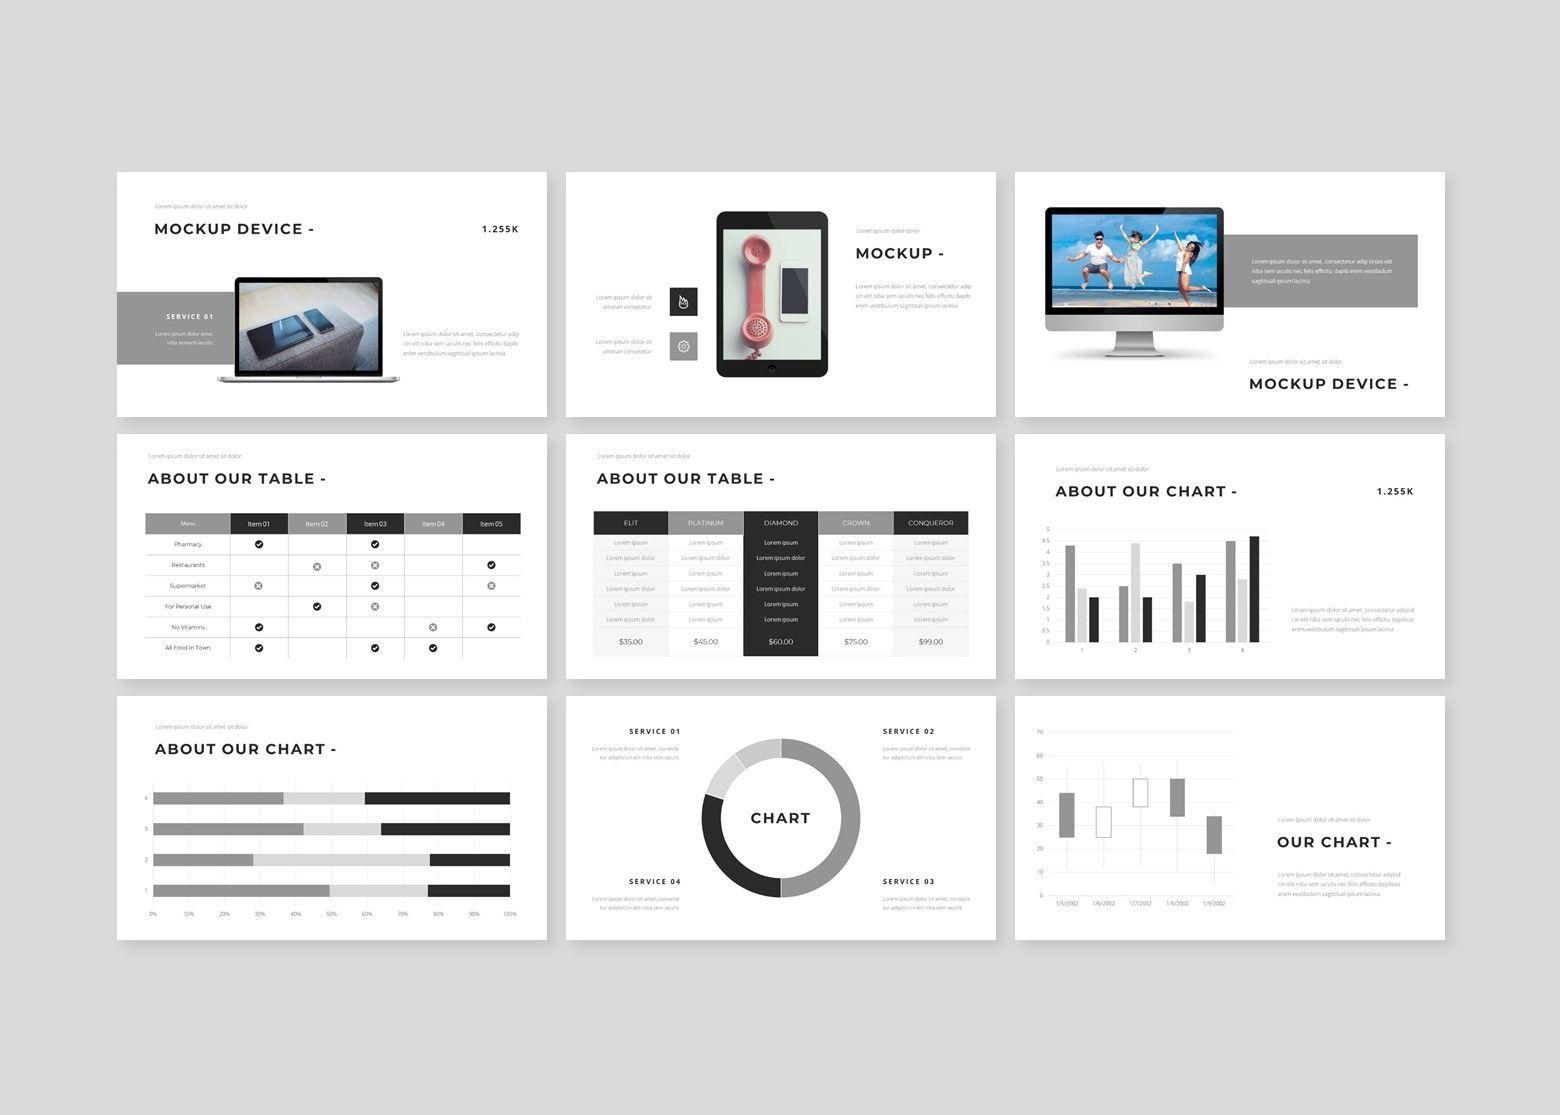 Fasionable – Creative Google Slide Business Template, Slide 4, 08642, Business Models — PoweredTemplate.com